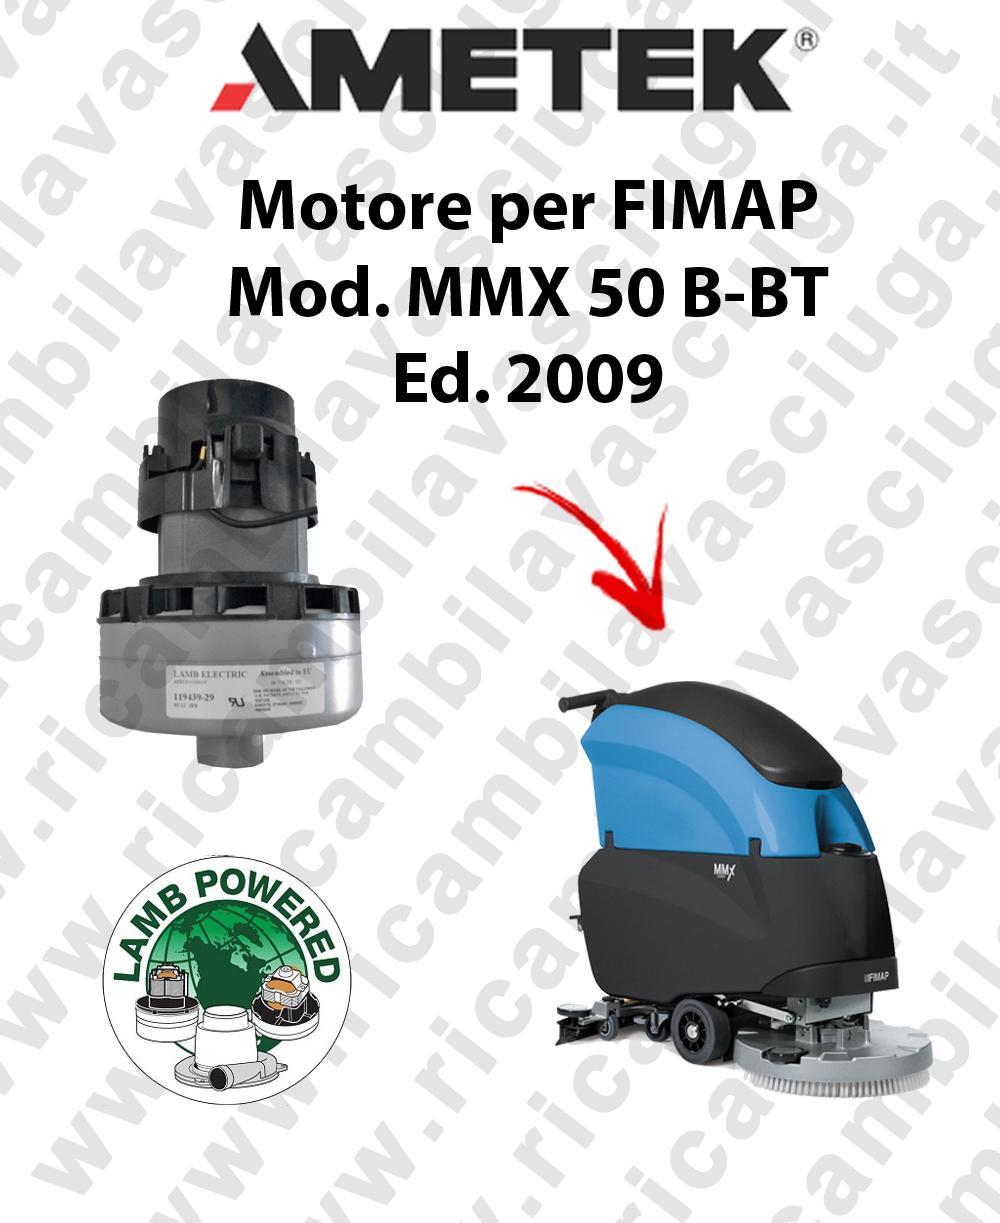 MMX 50 B-BT Ed. 2009 MOTORE aspirazione LAMB AMETEK lavapavimenti FIMAP